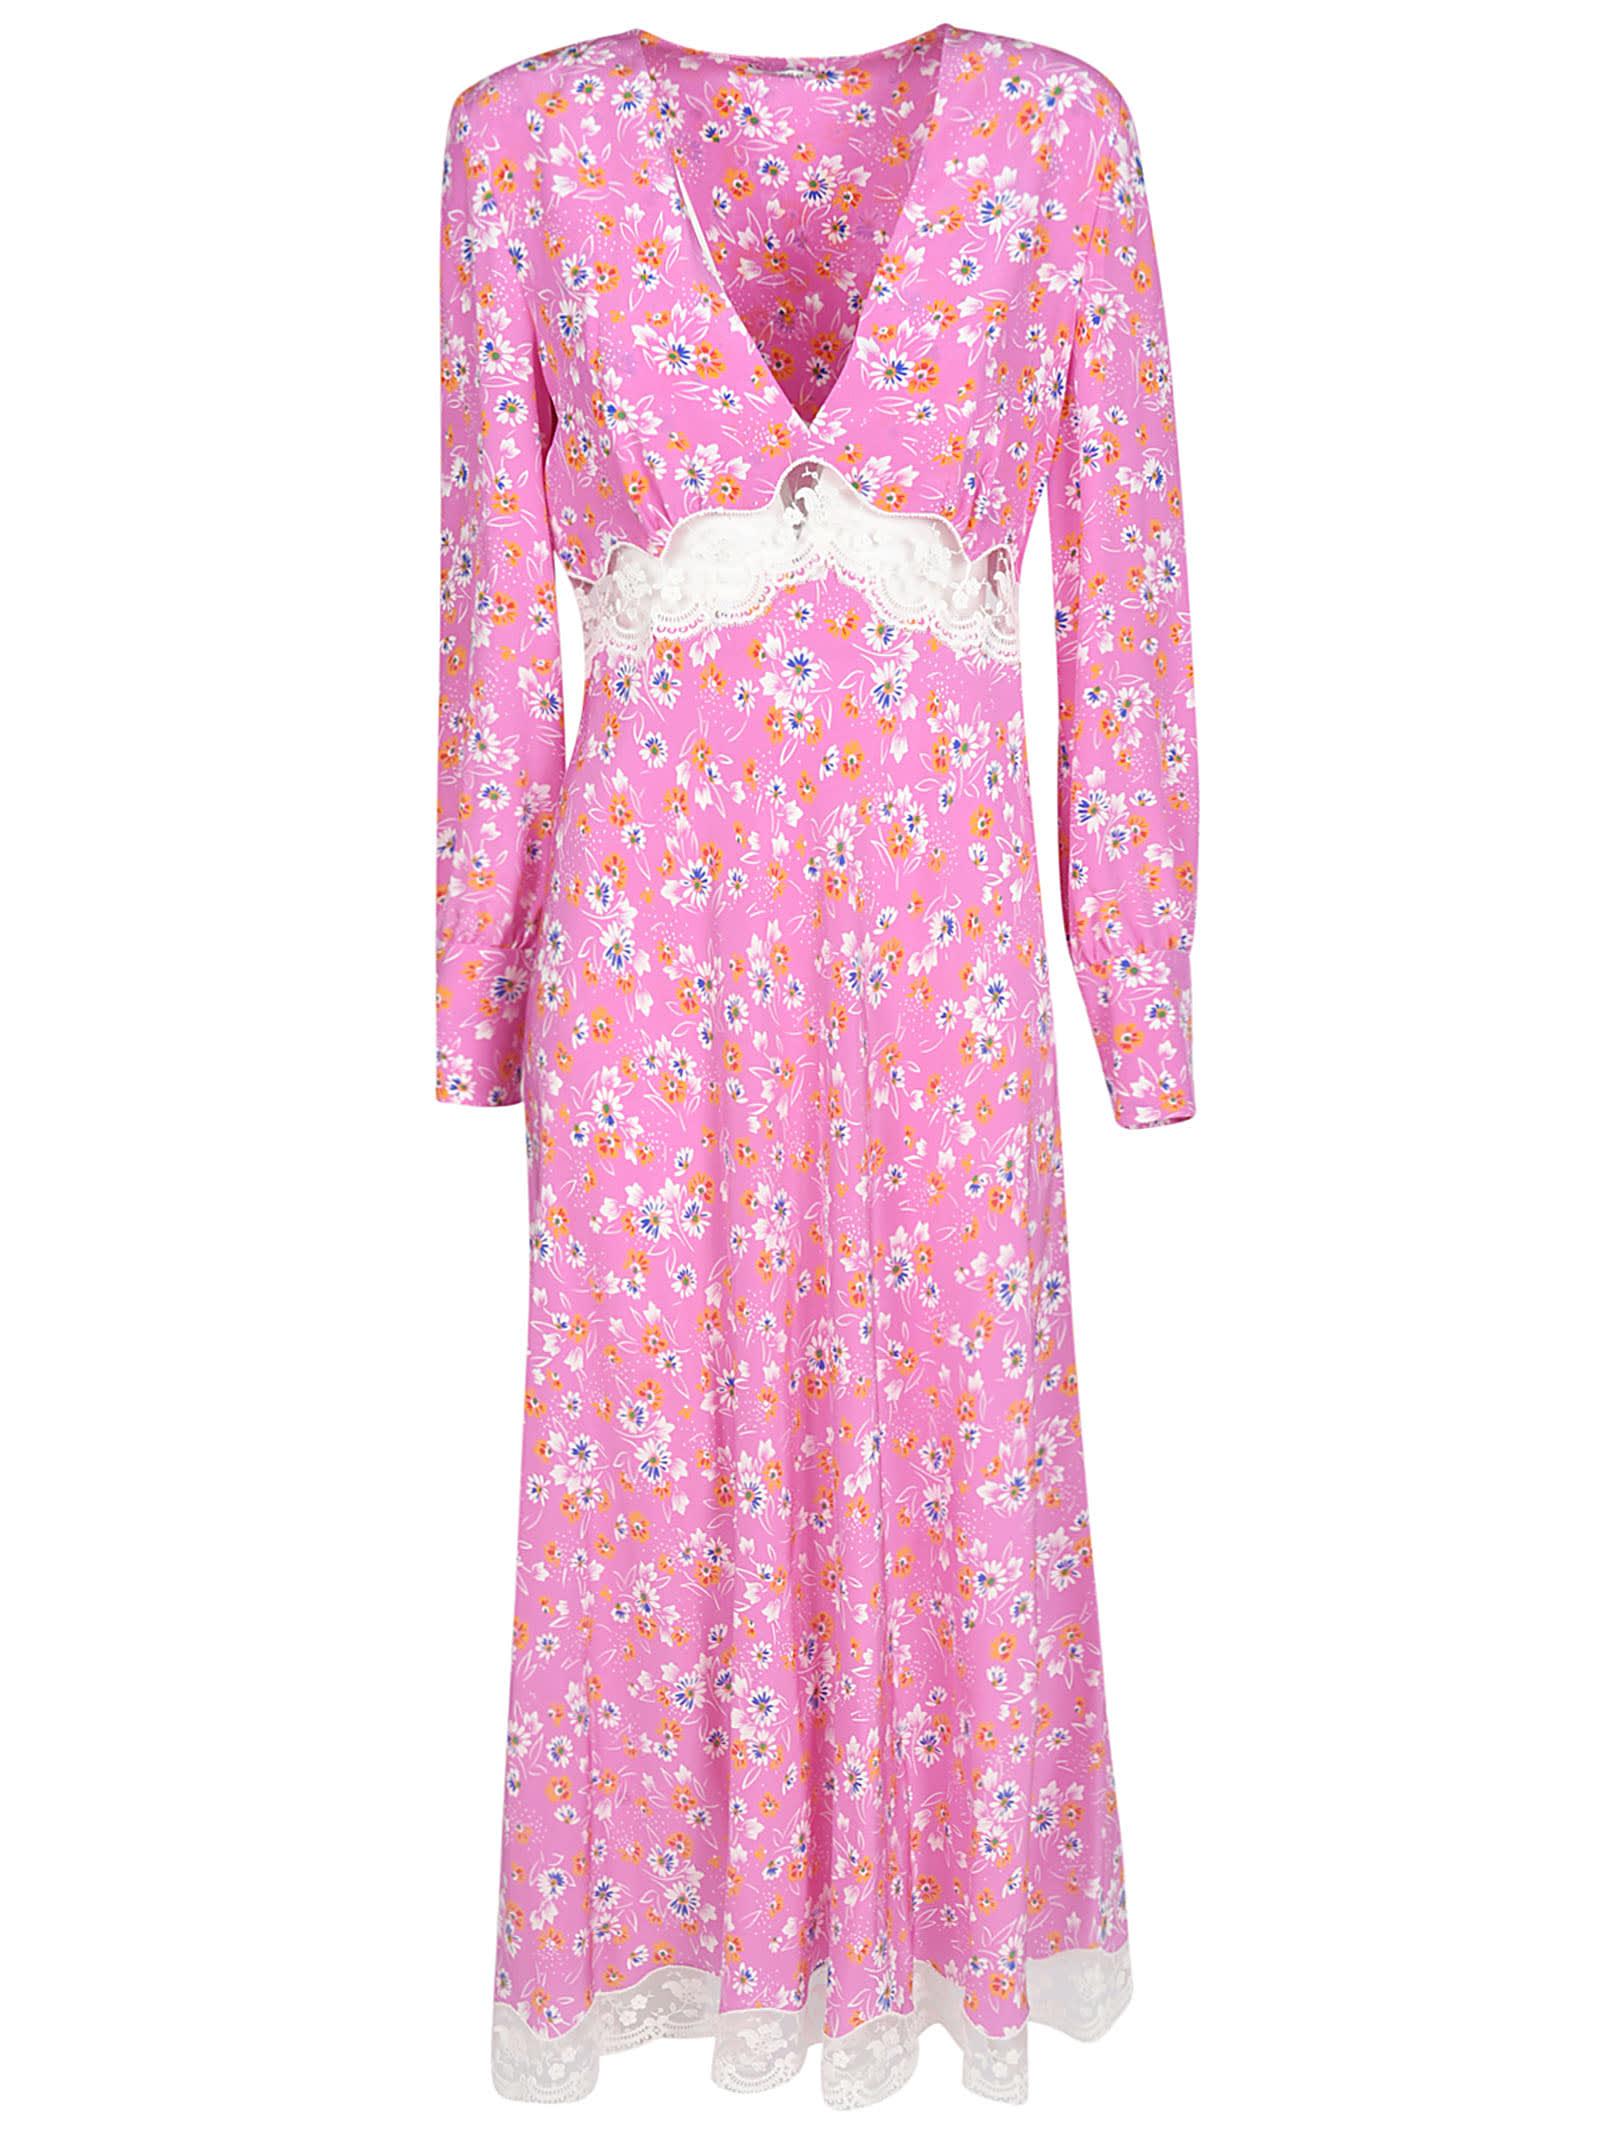 Buy Miu Miu Floral Dress online, shop Miu Miu with free shipping